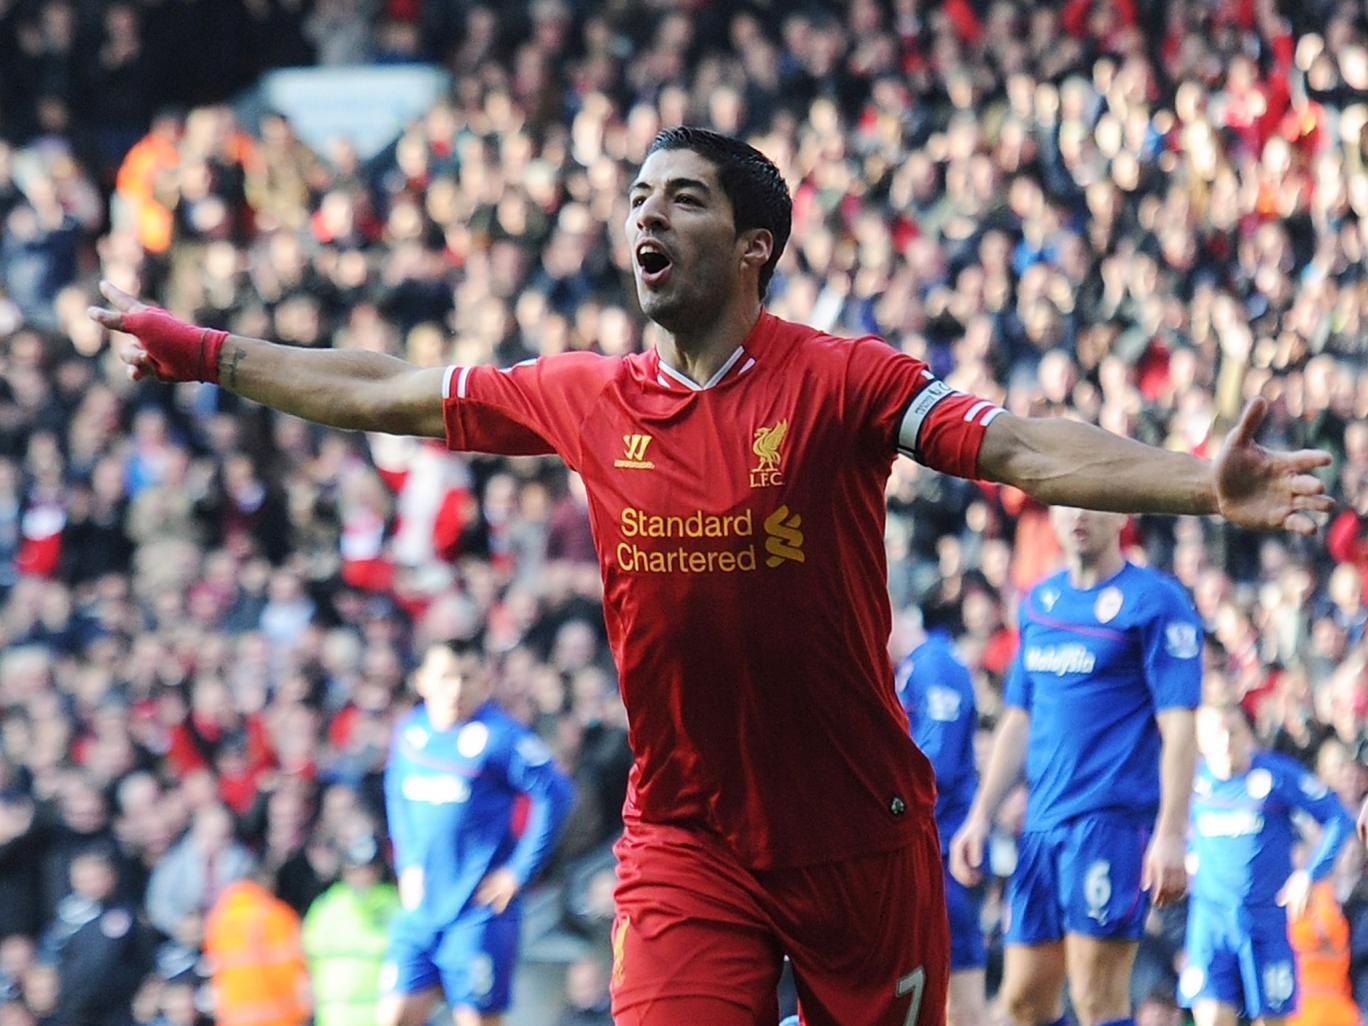 Luis Suarez celebrates after scoring for Liverpool against Cardiff City